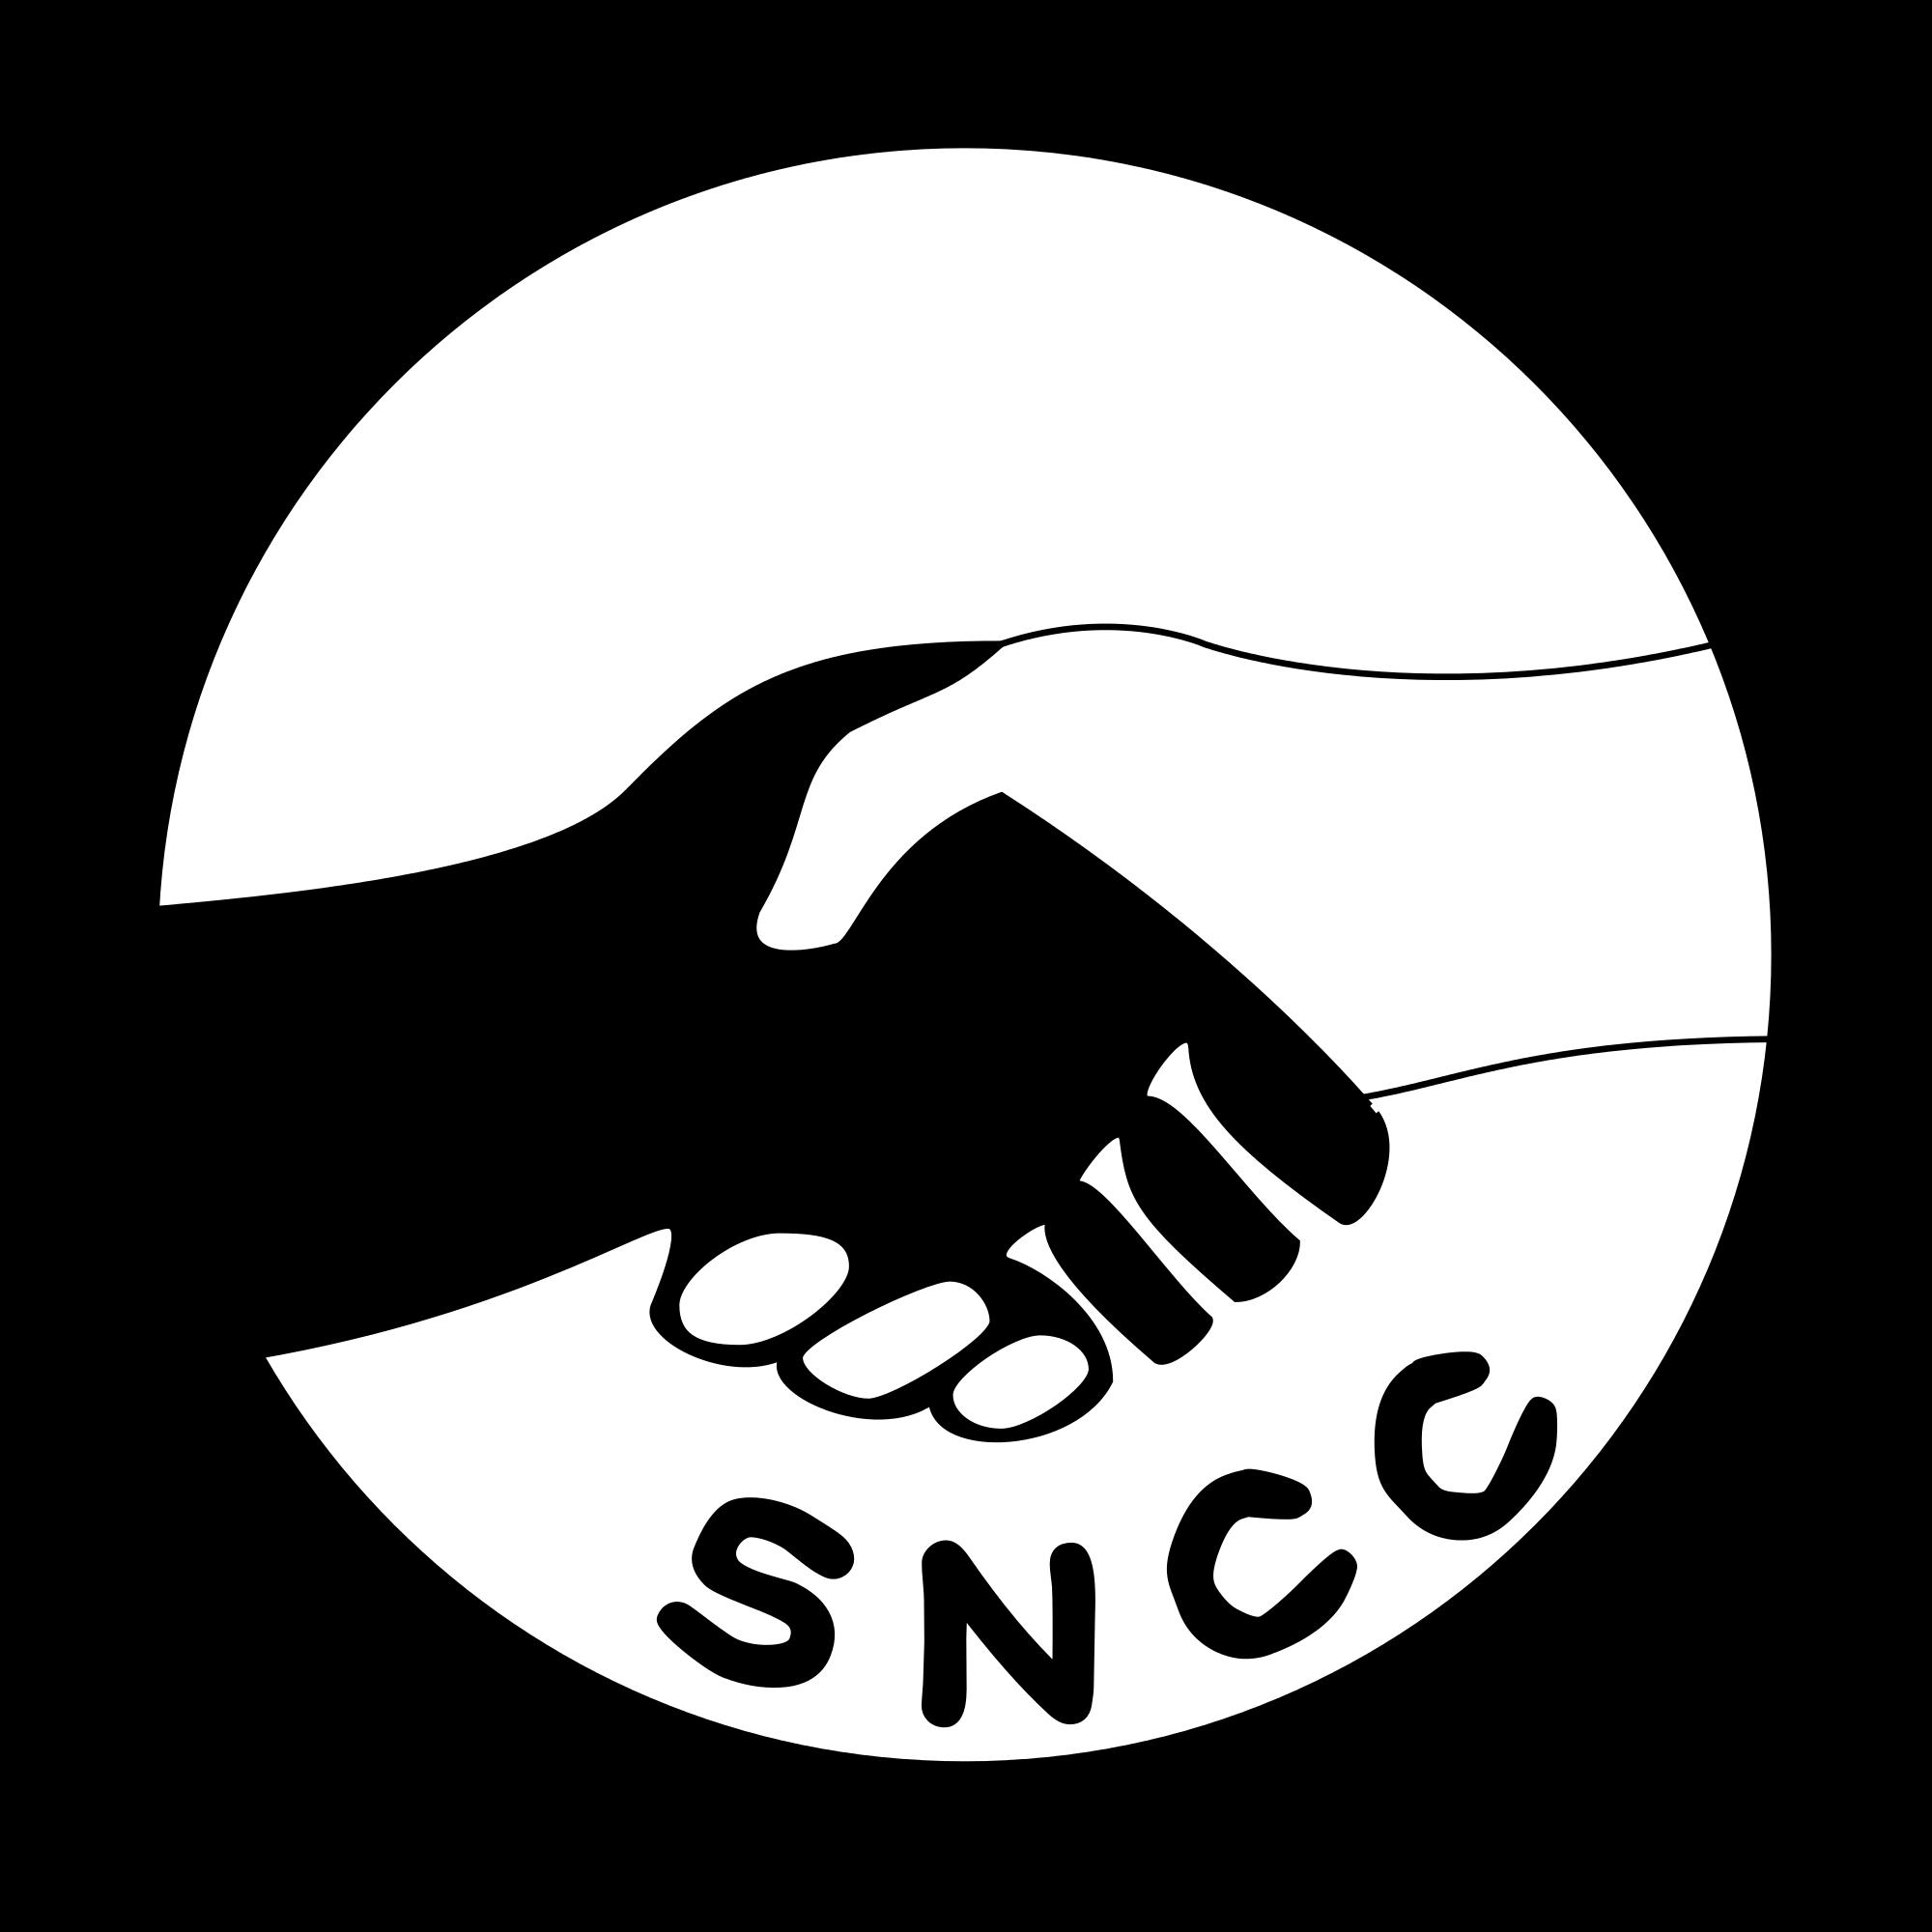 Handshake clipart civil law. File logo sncc svg